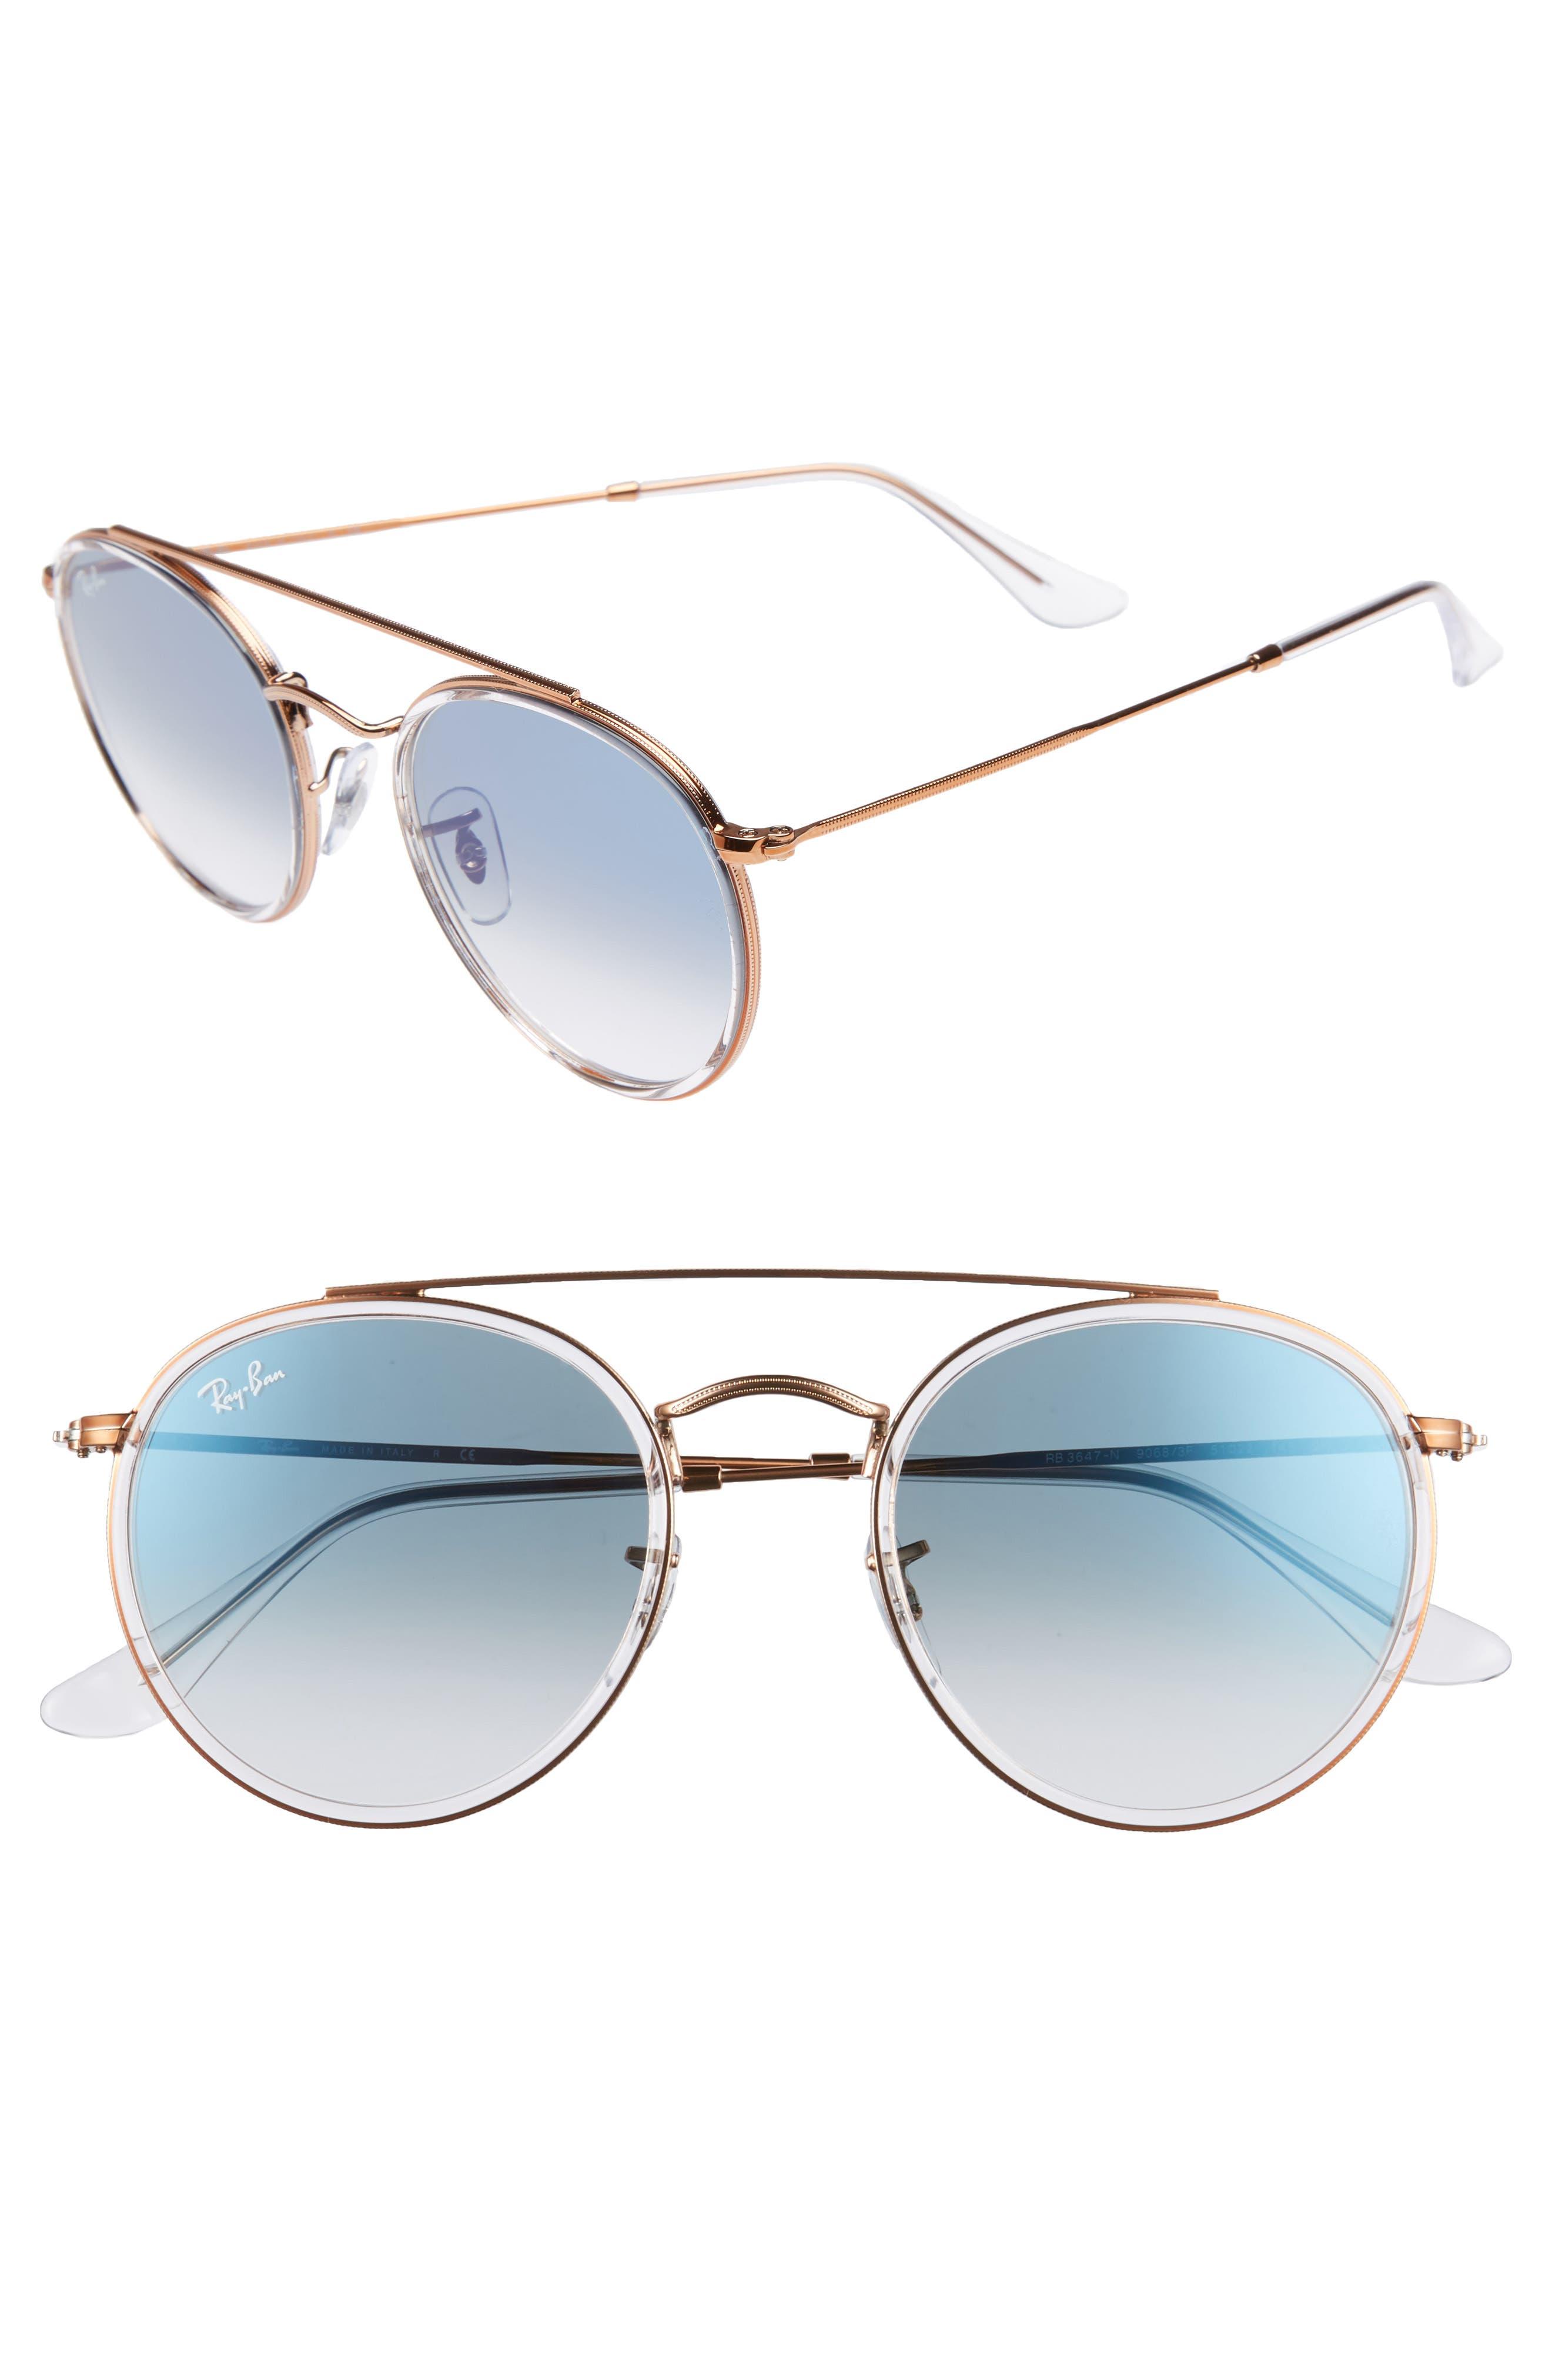 51mm Aviator Gradient Lens Sunglasses,                         Main,                         color, Blue Transparent